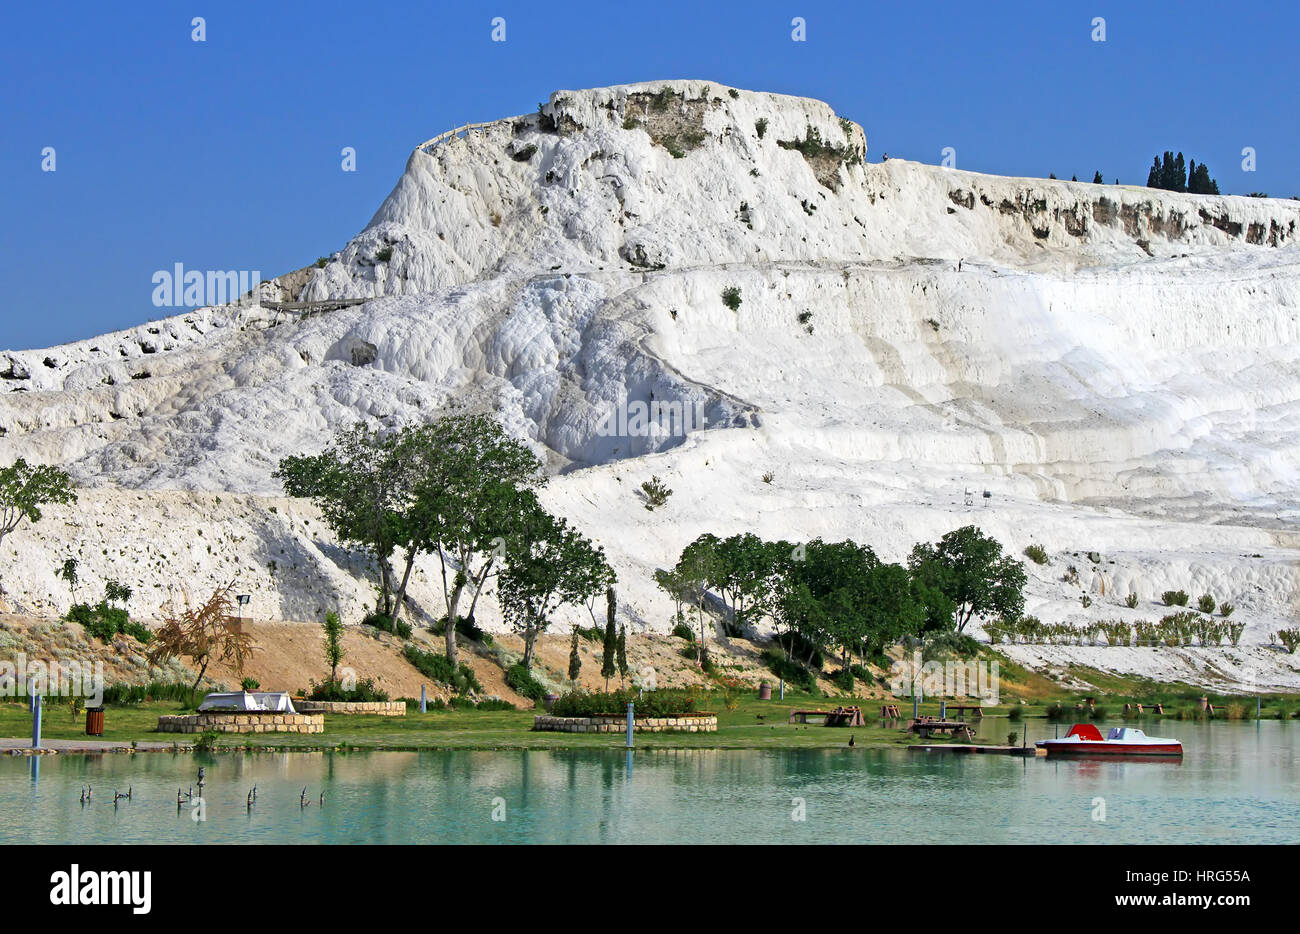 Lake and calcified limestone terraces on background, Pamukkale, Turkey - Stock Image